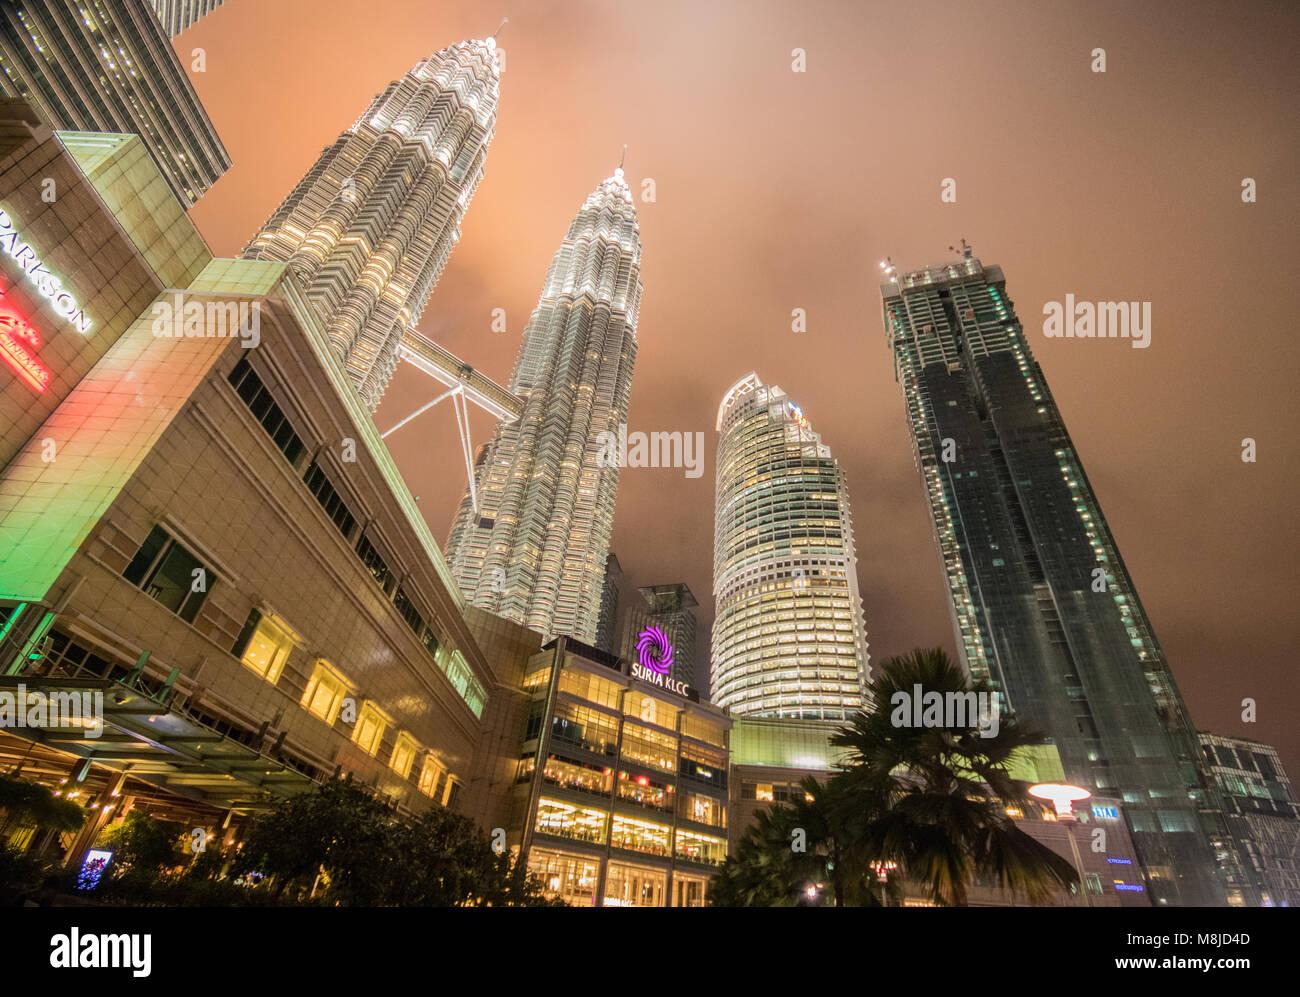 Petronas Towers in der Nacht, KLCC, Kuala Lumpur, Malaysia Stockbild